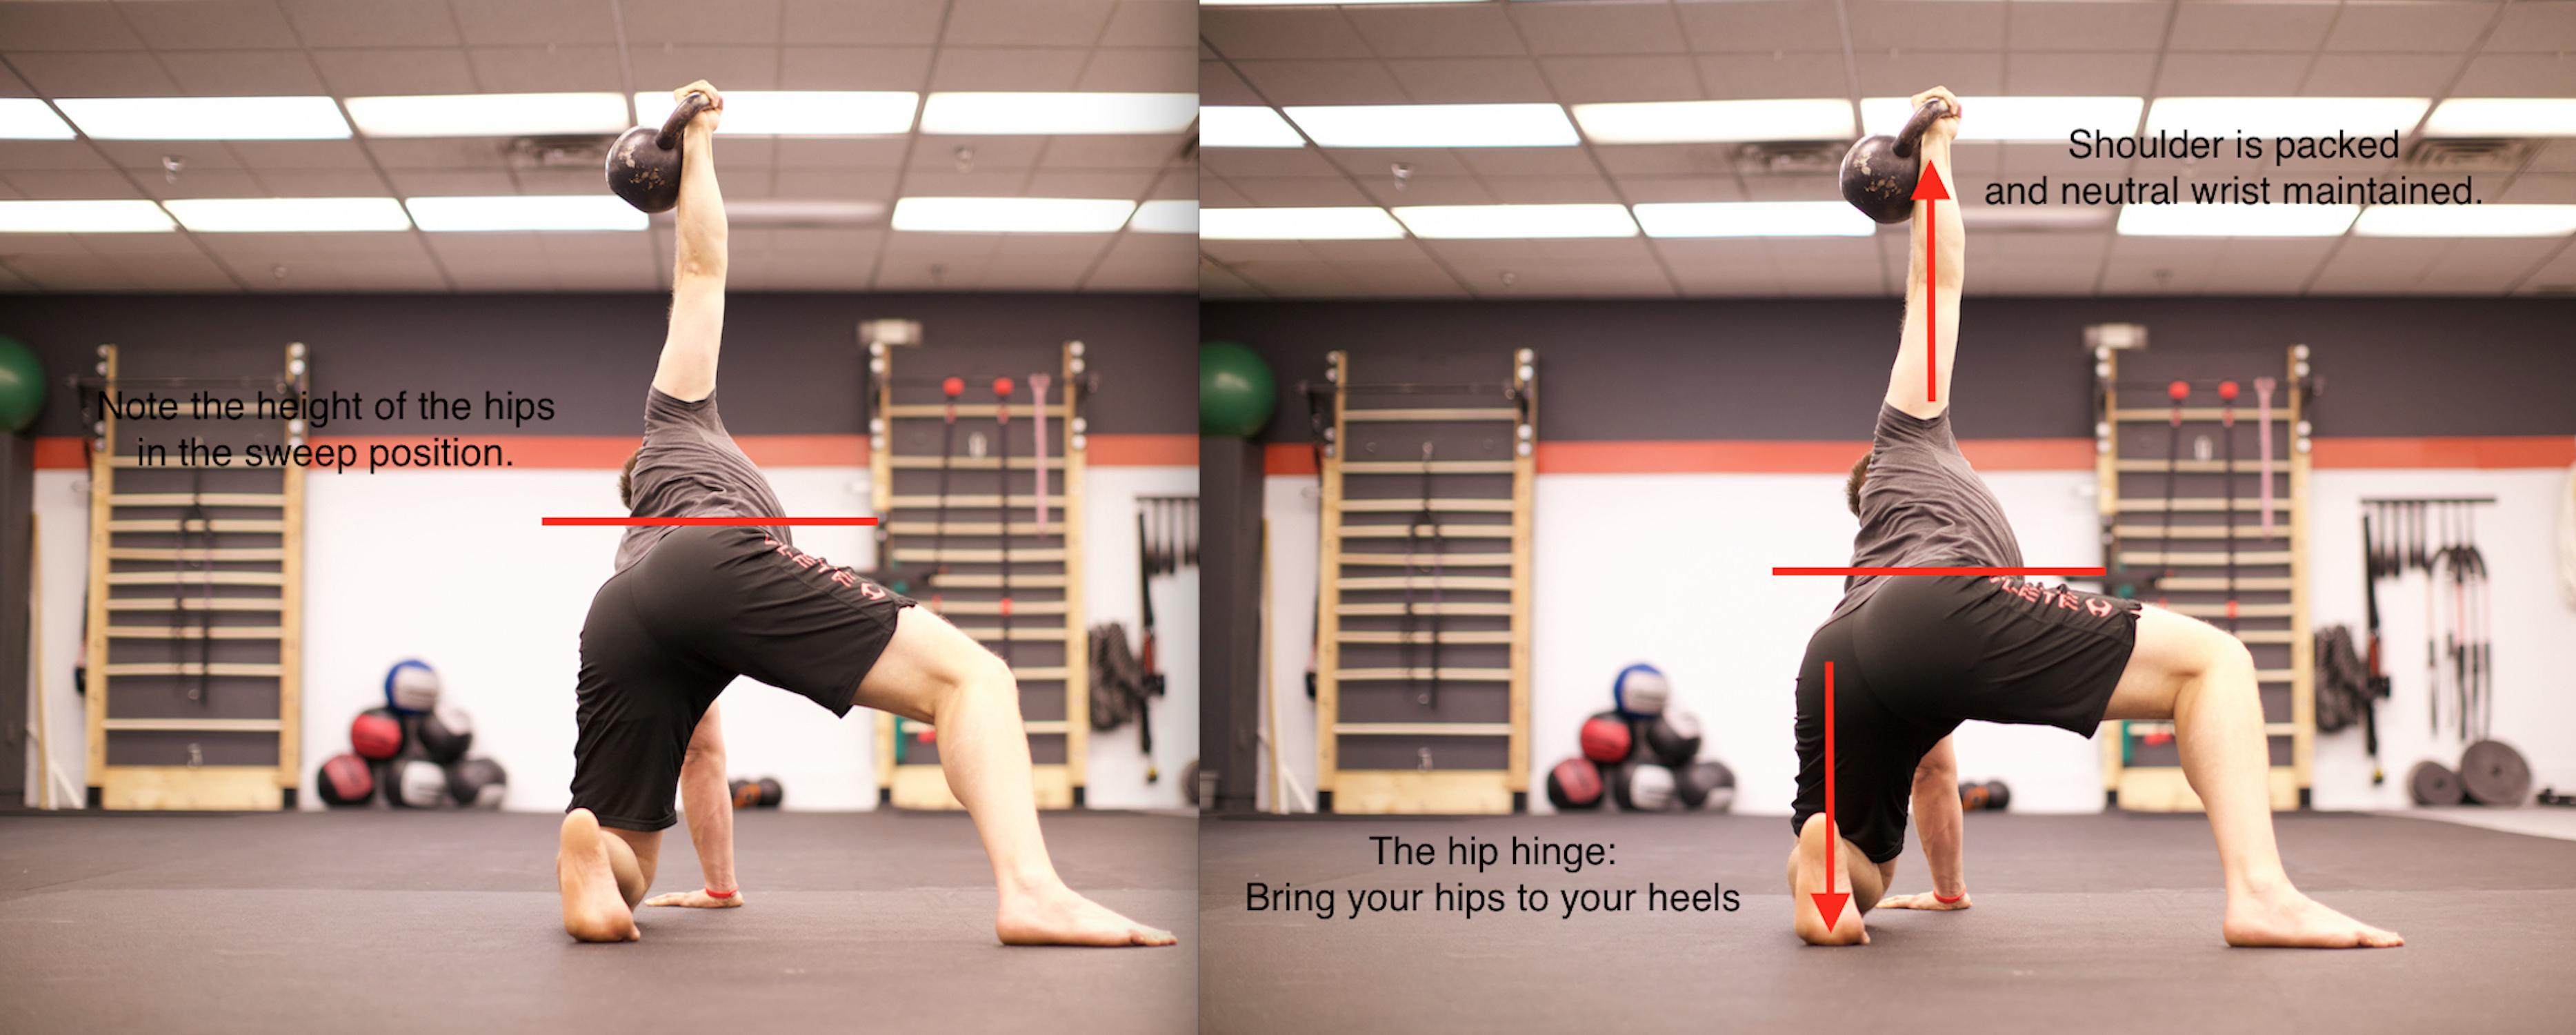 The hip hinge begins the transition to half-kneeling